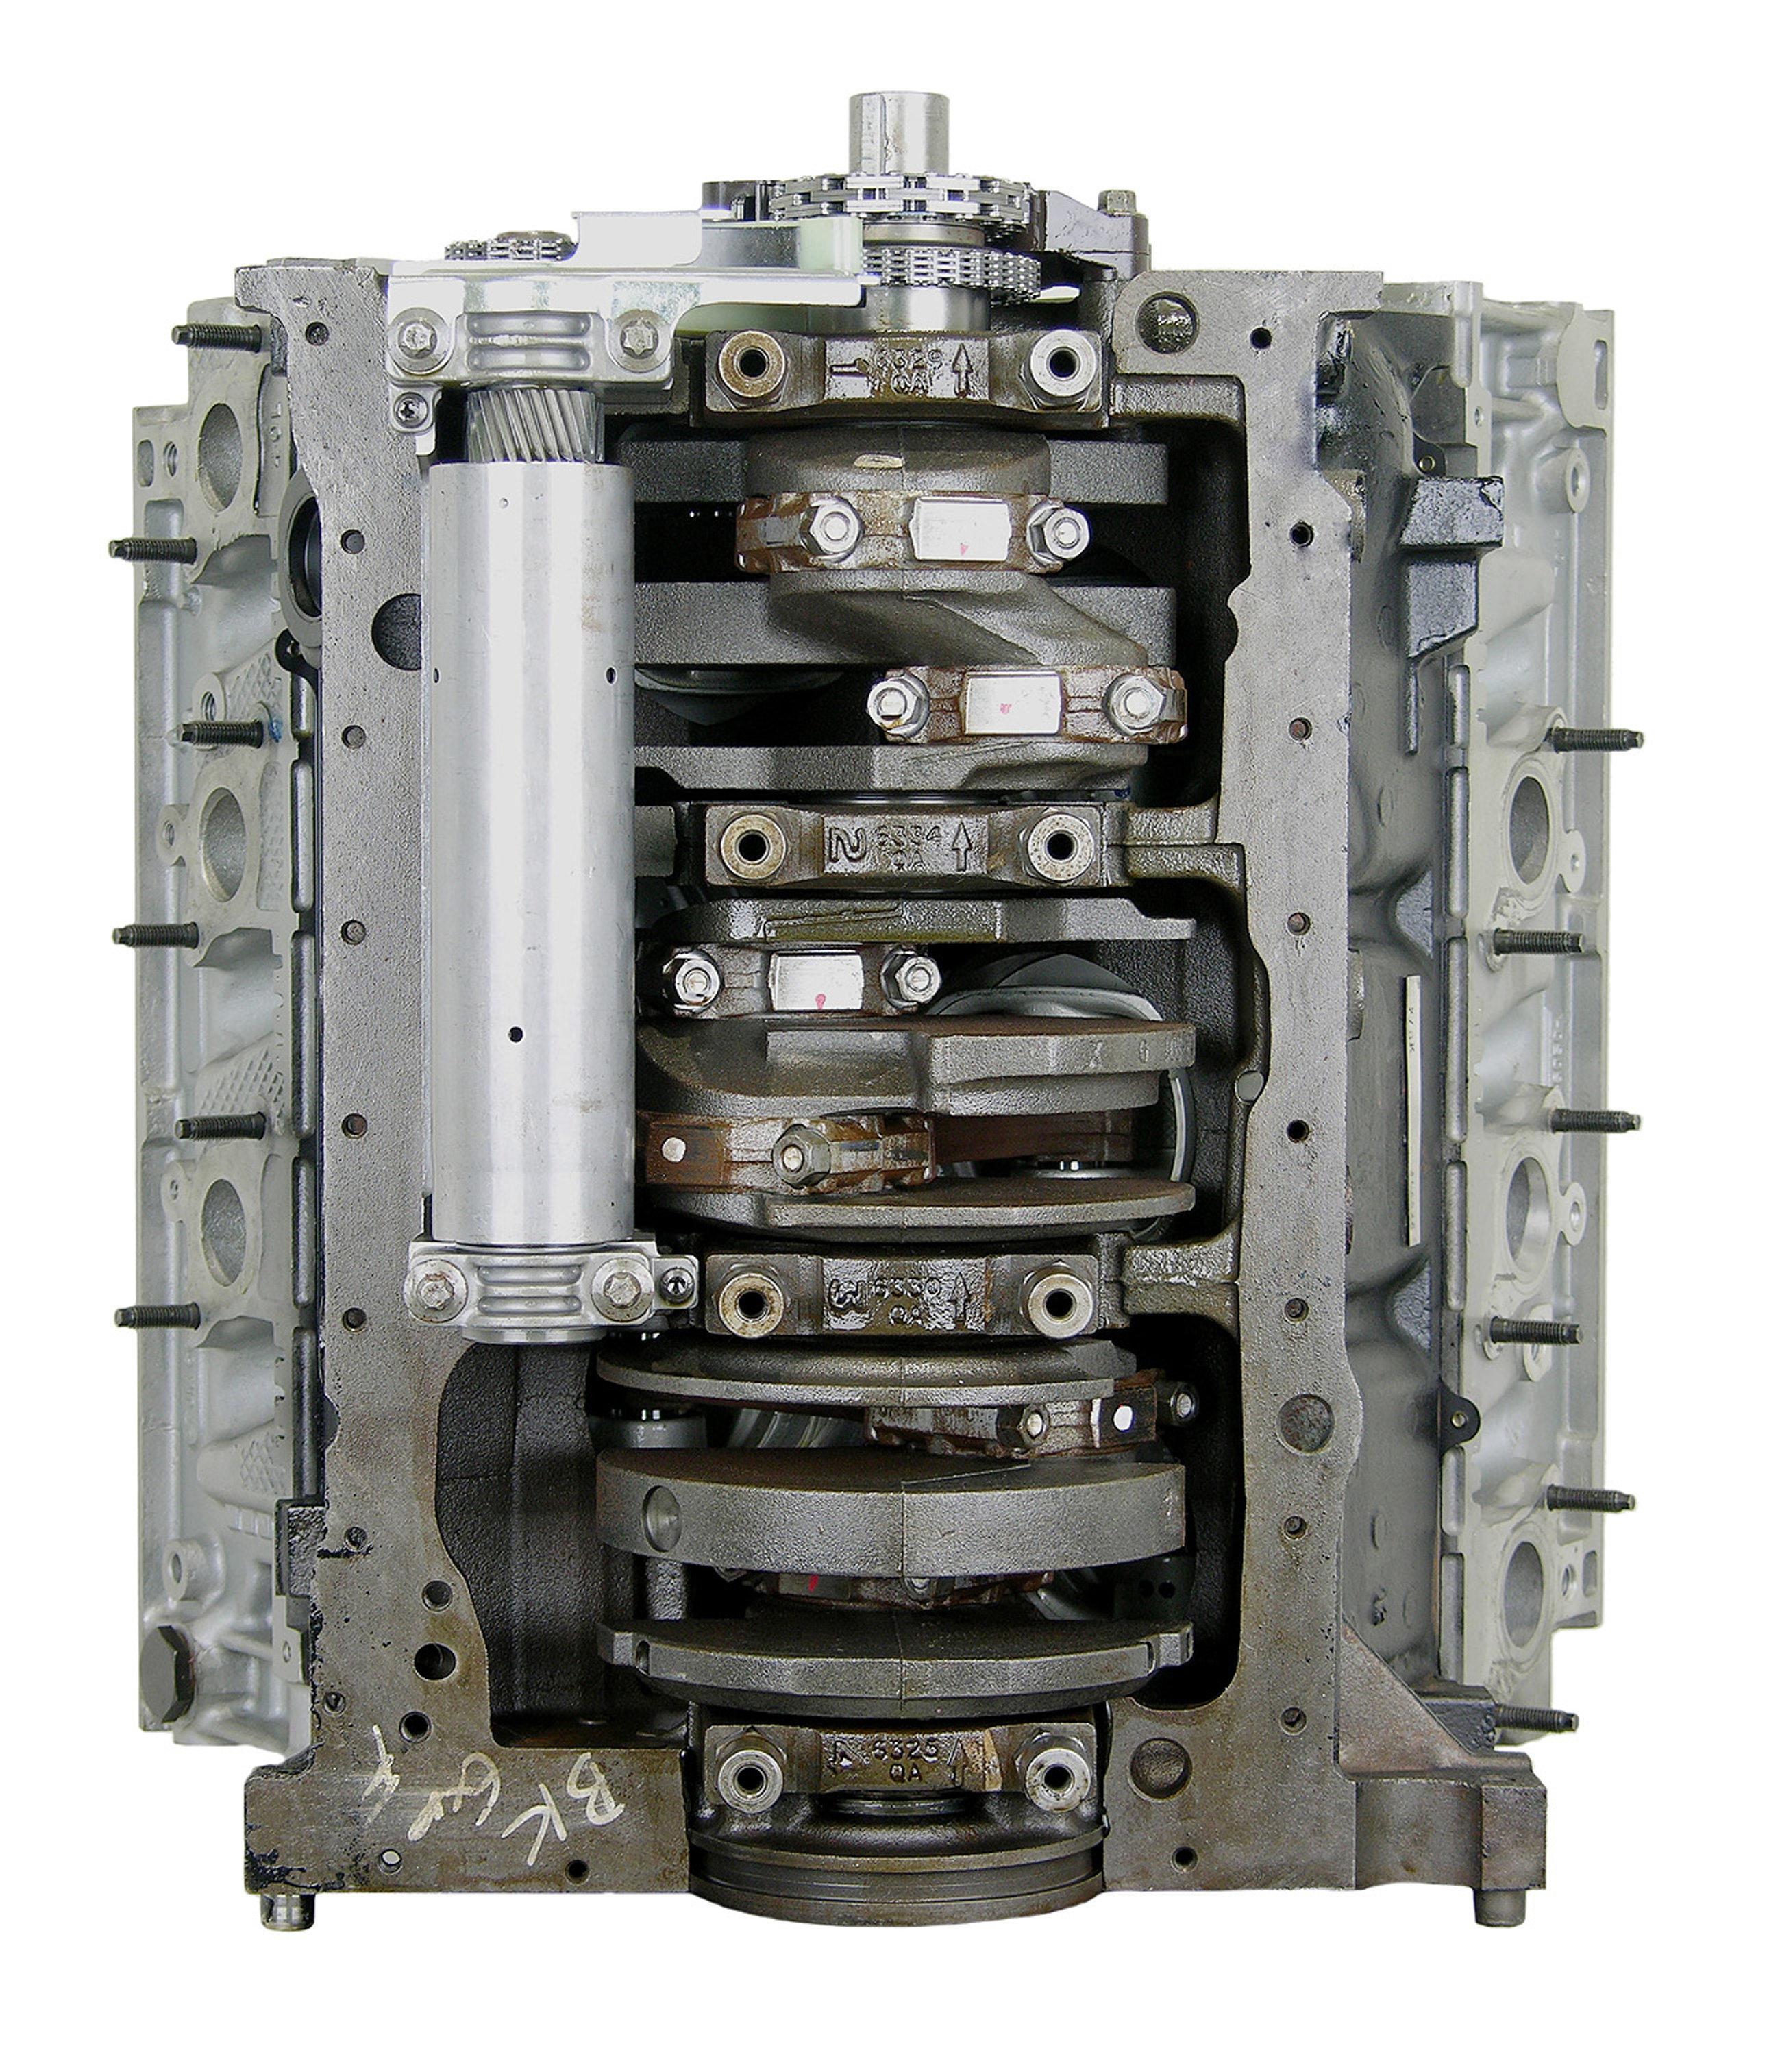 97-01 4.0-Liter SOHC V6 Mercury Mountaineer Engine